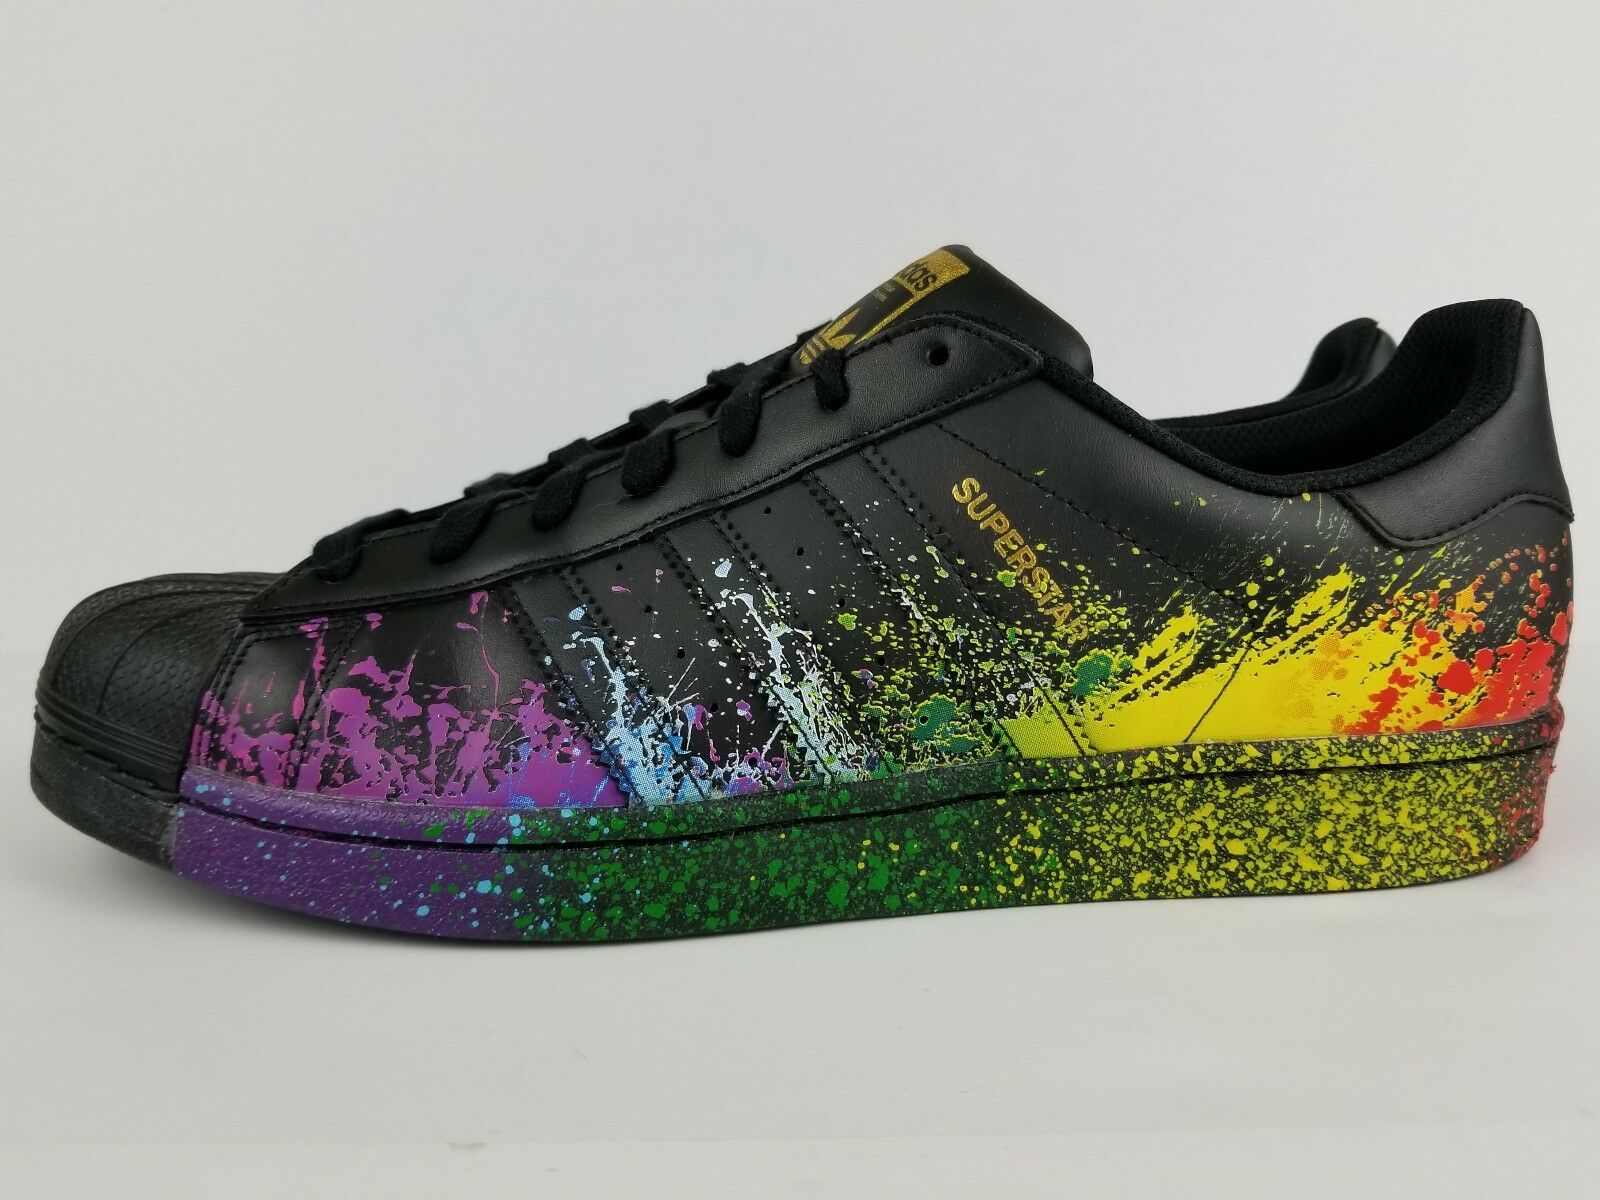 Adidas pack originals männer superstar stolz pack Adidas schuhe größe 11,5 bb1687 schwarze regenbogen 5cf2f6